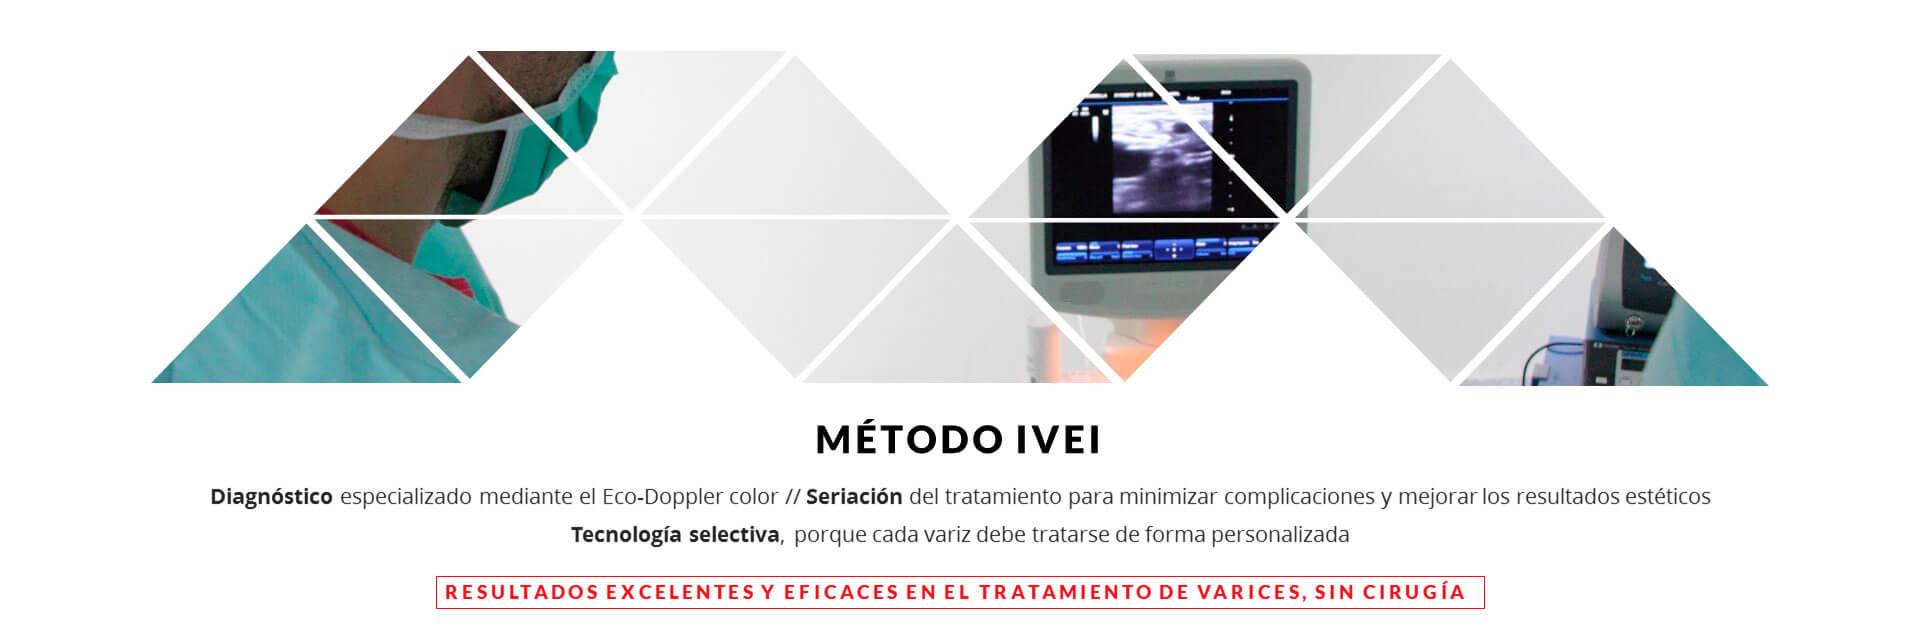 Metodo IVEI Varices sin cirugia